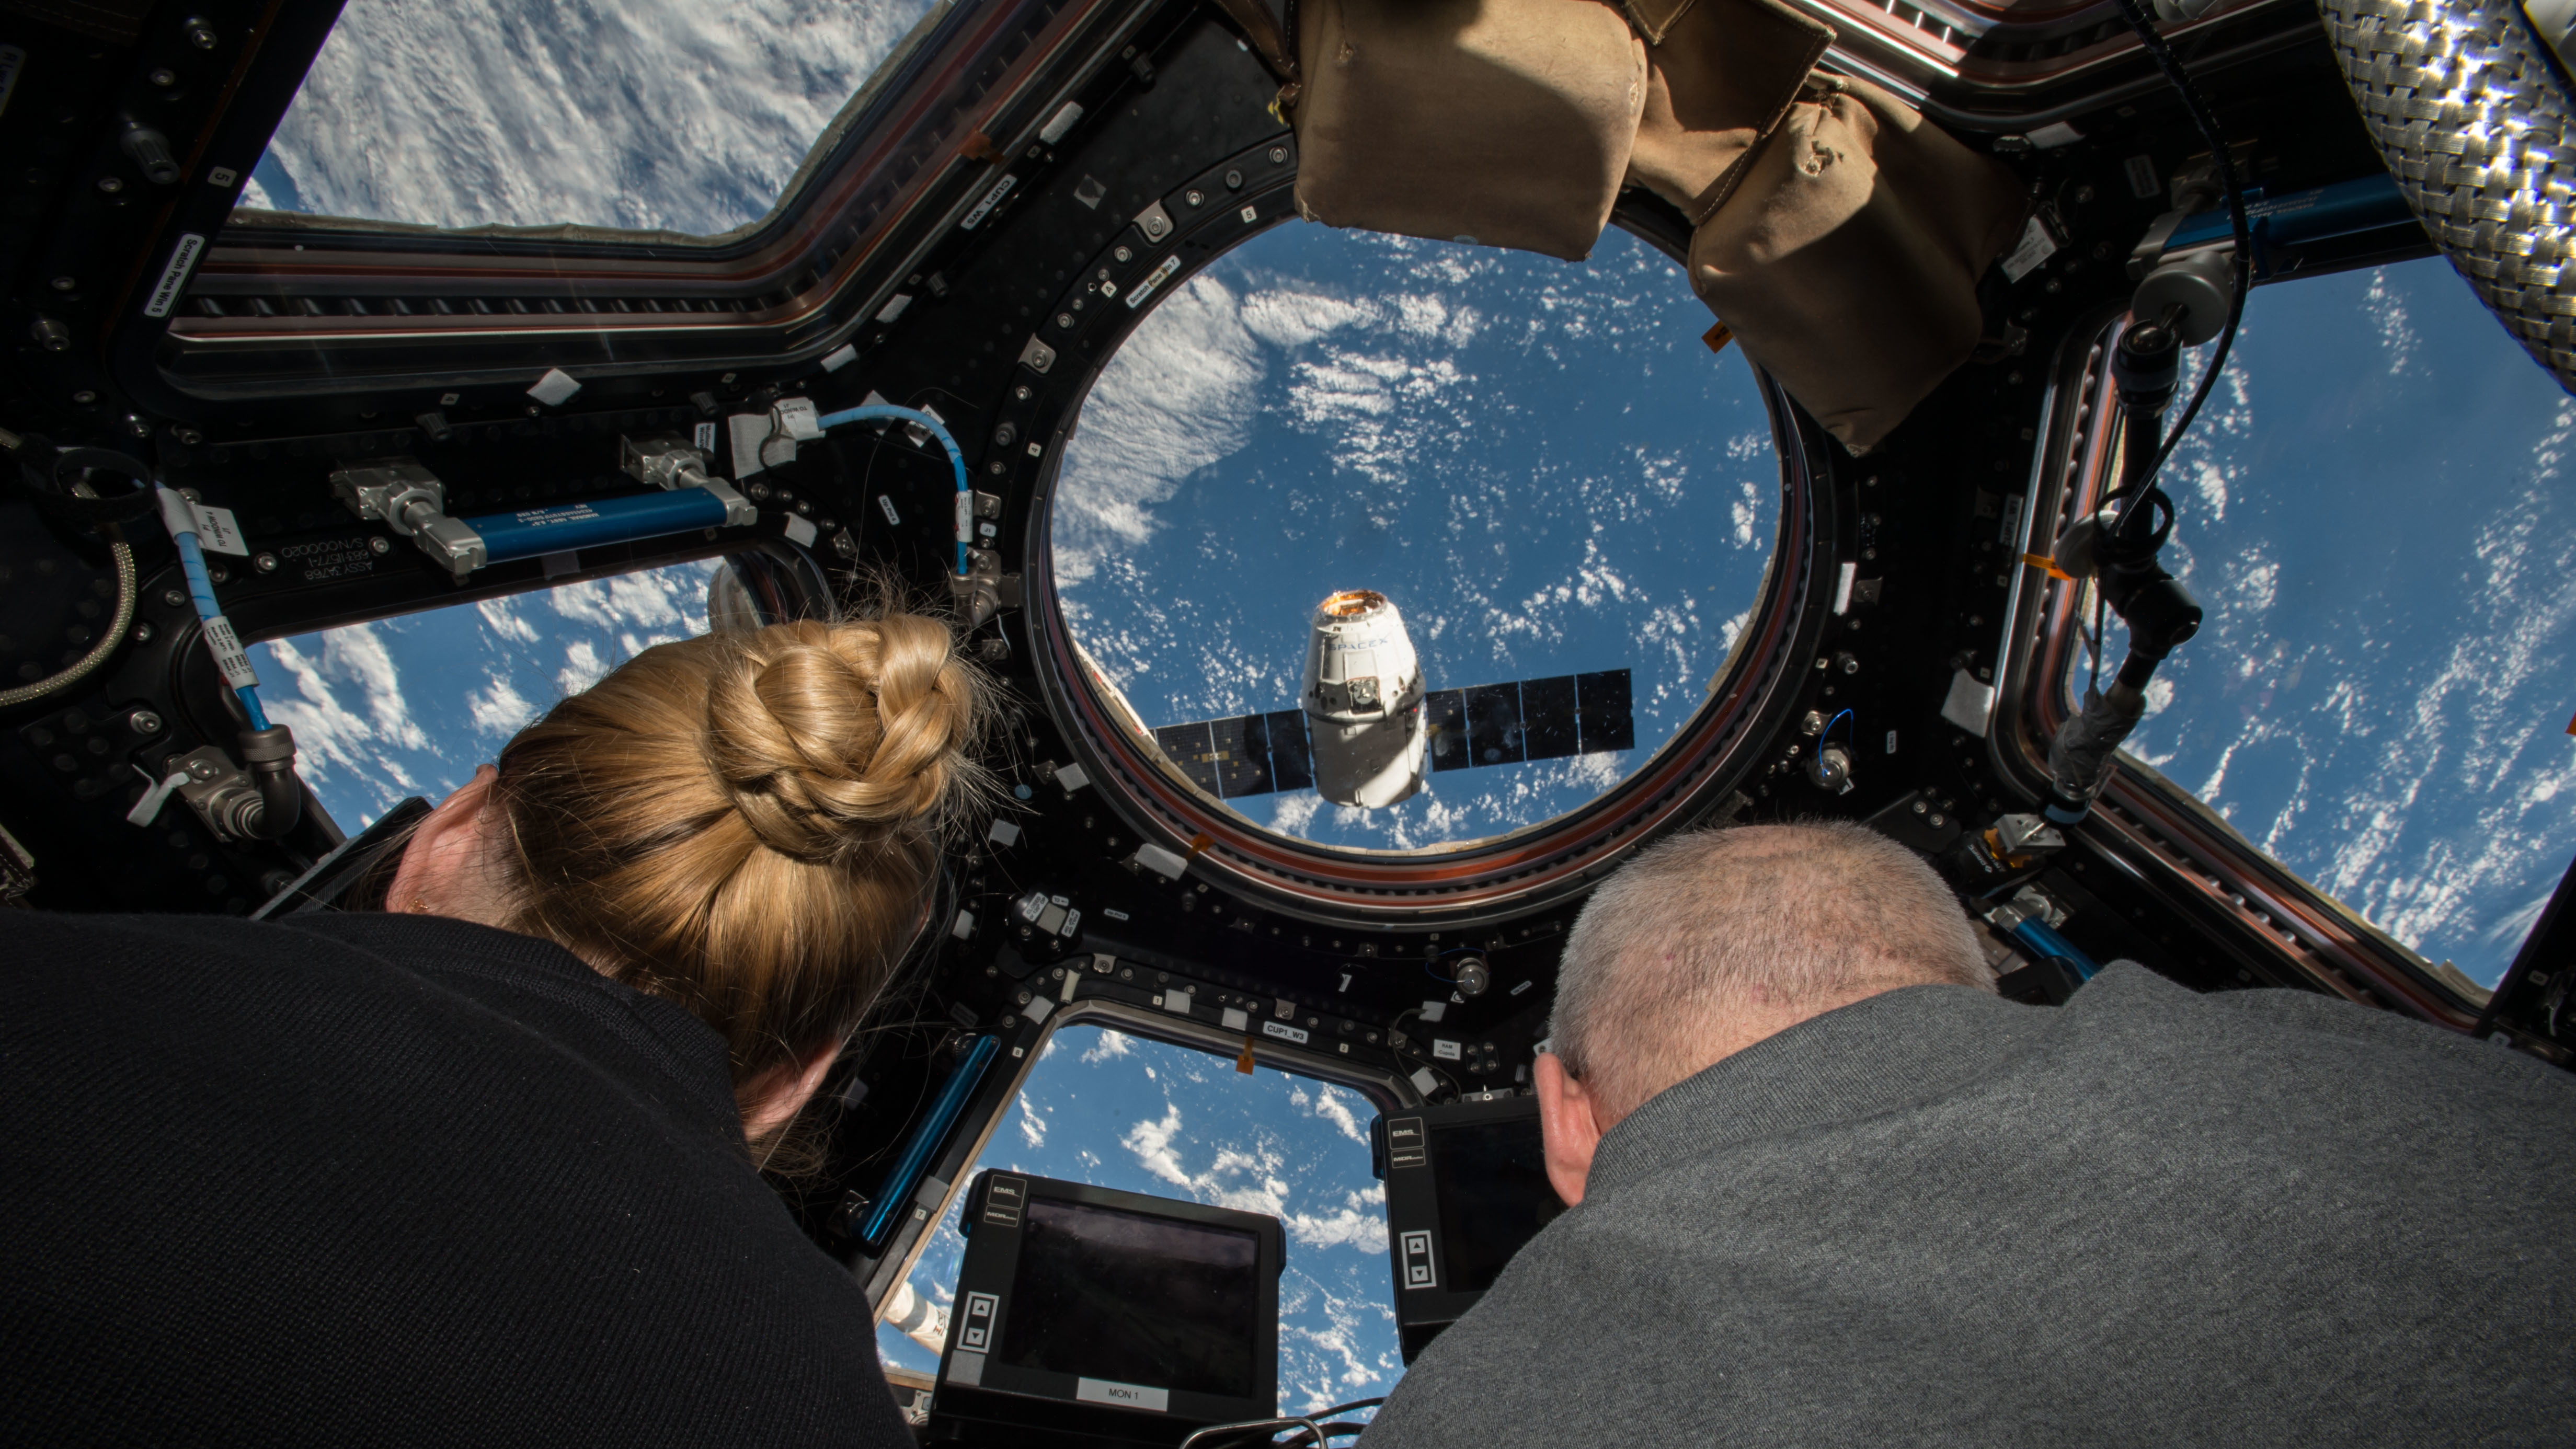 inside space ship docking station - photo #7